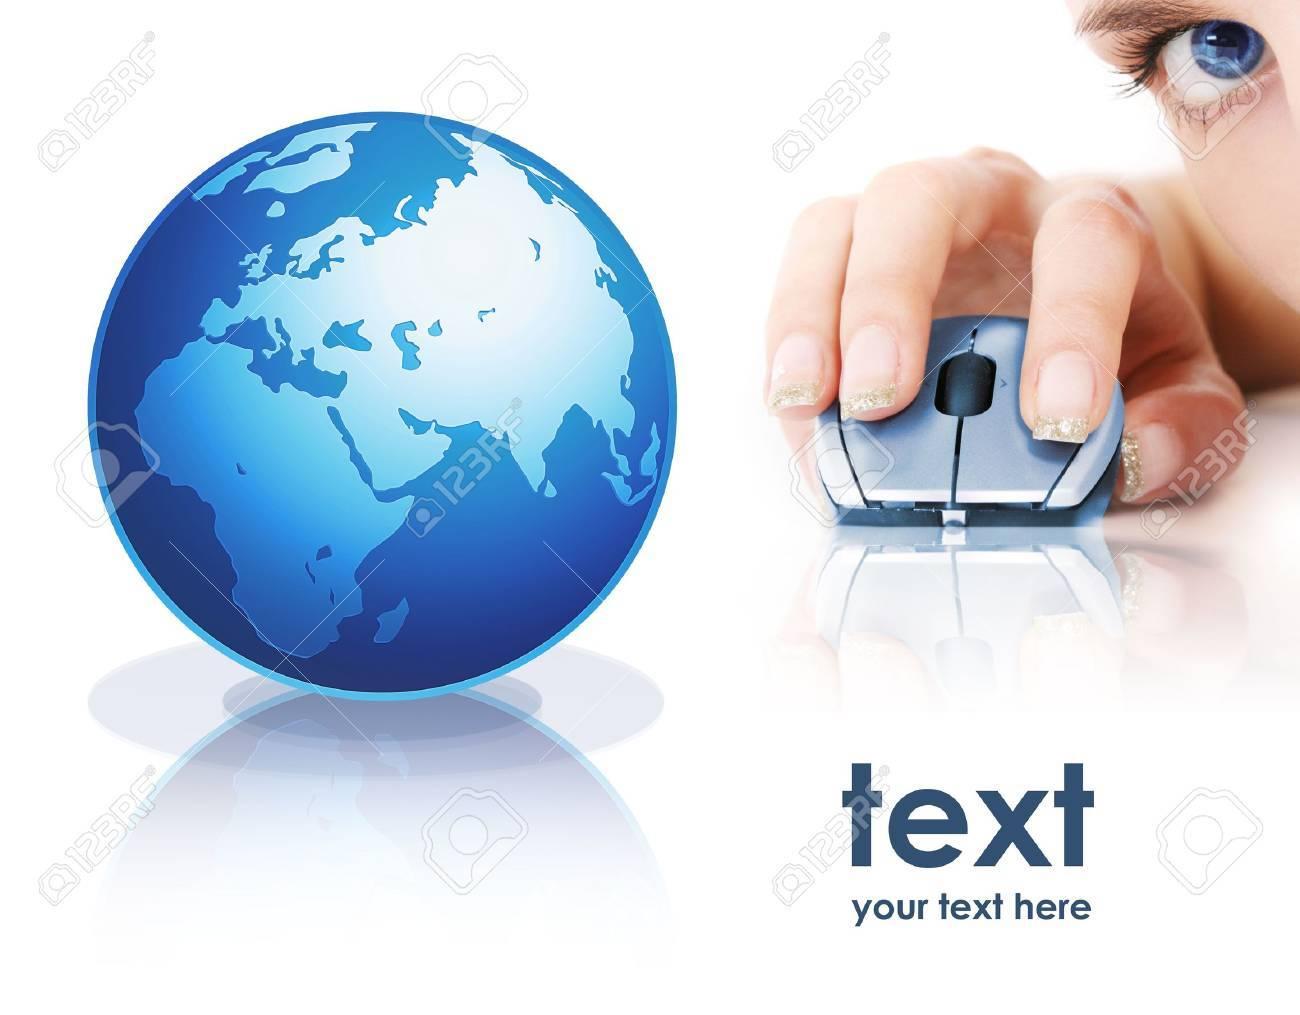 technology Stock Photo - 5558416